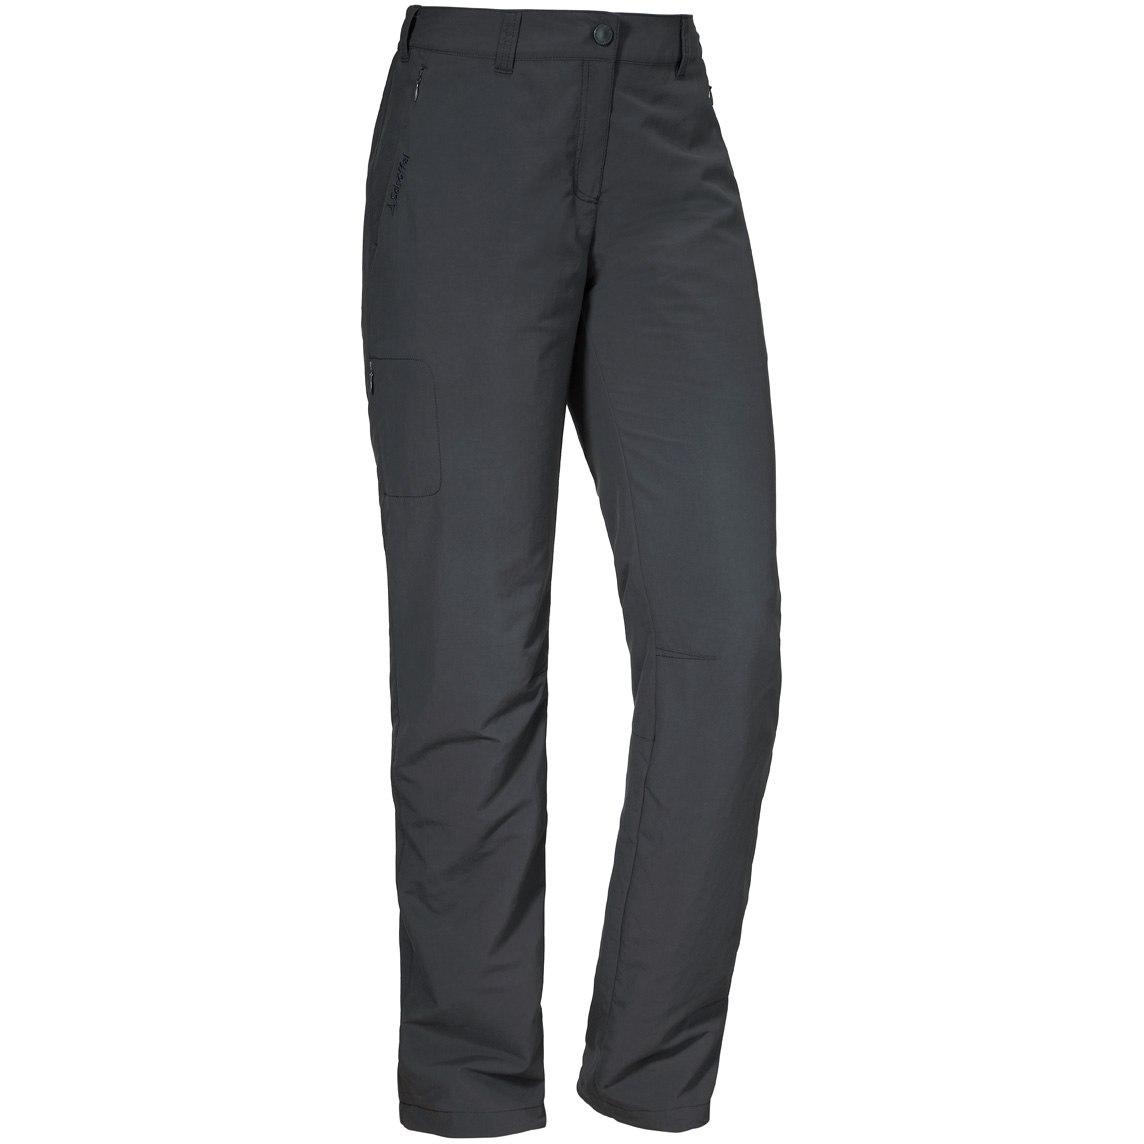 Schöffel Santa Fe WP Long Pants for Women - black 9990